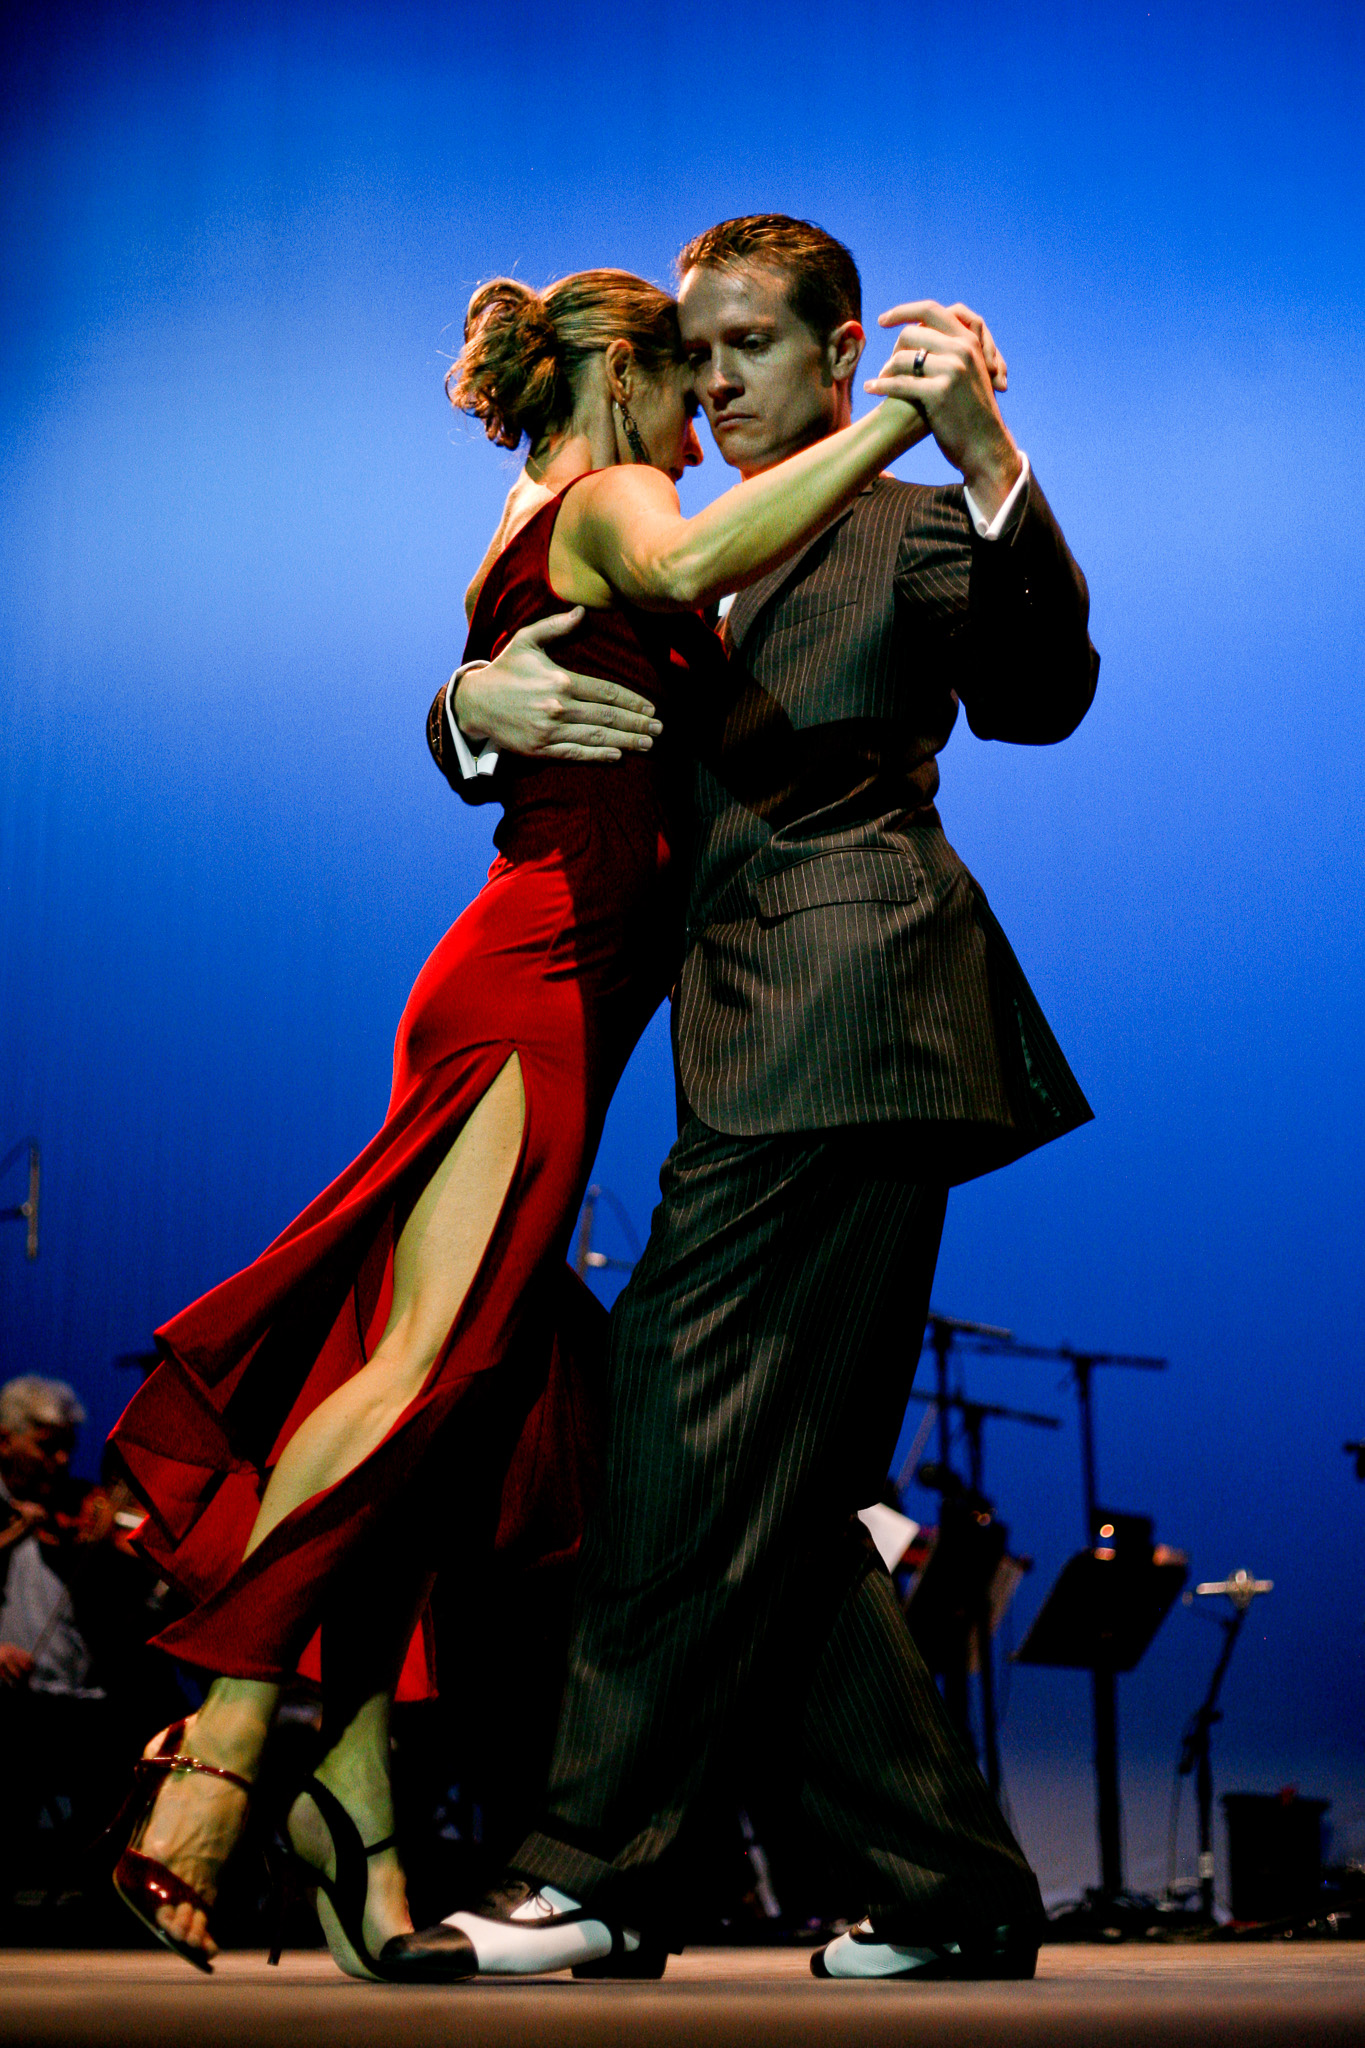 dance-love-argentine-tango--17.jpg